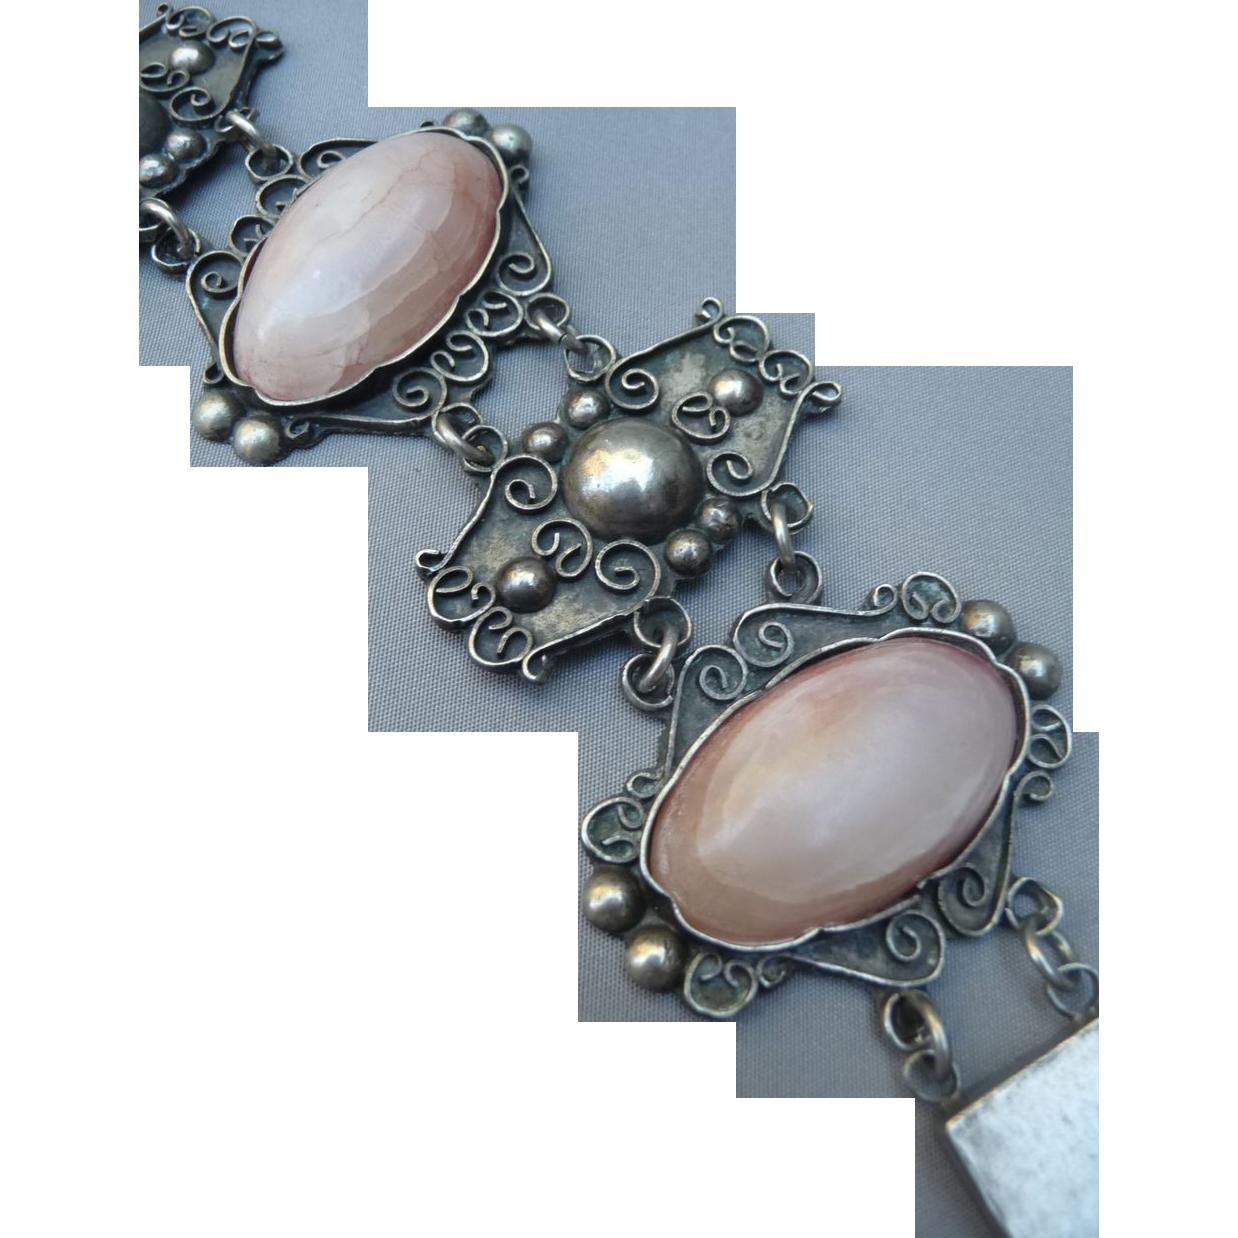 Vintage Old Silver Mexican Agate Bracelet.